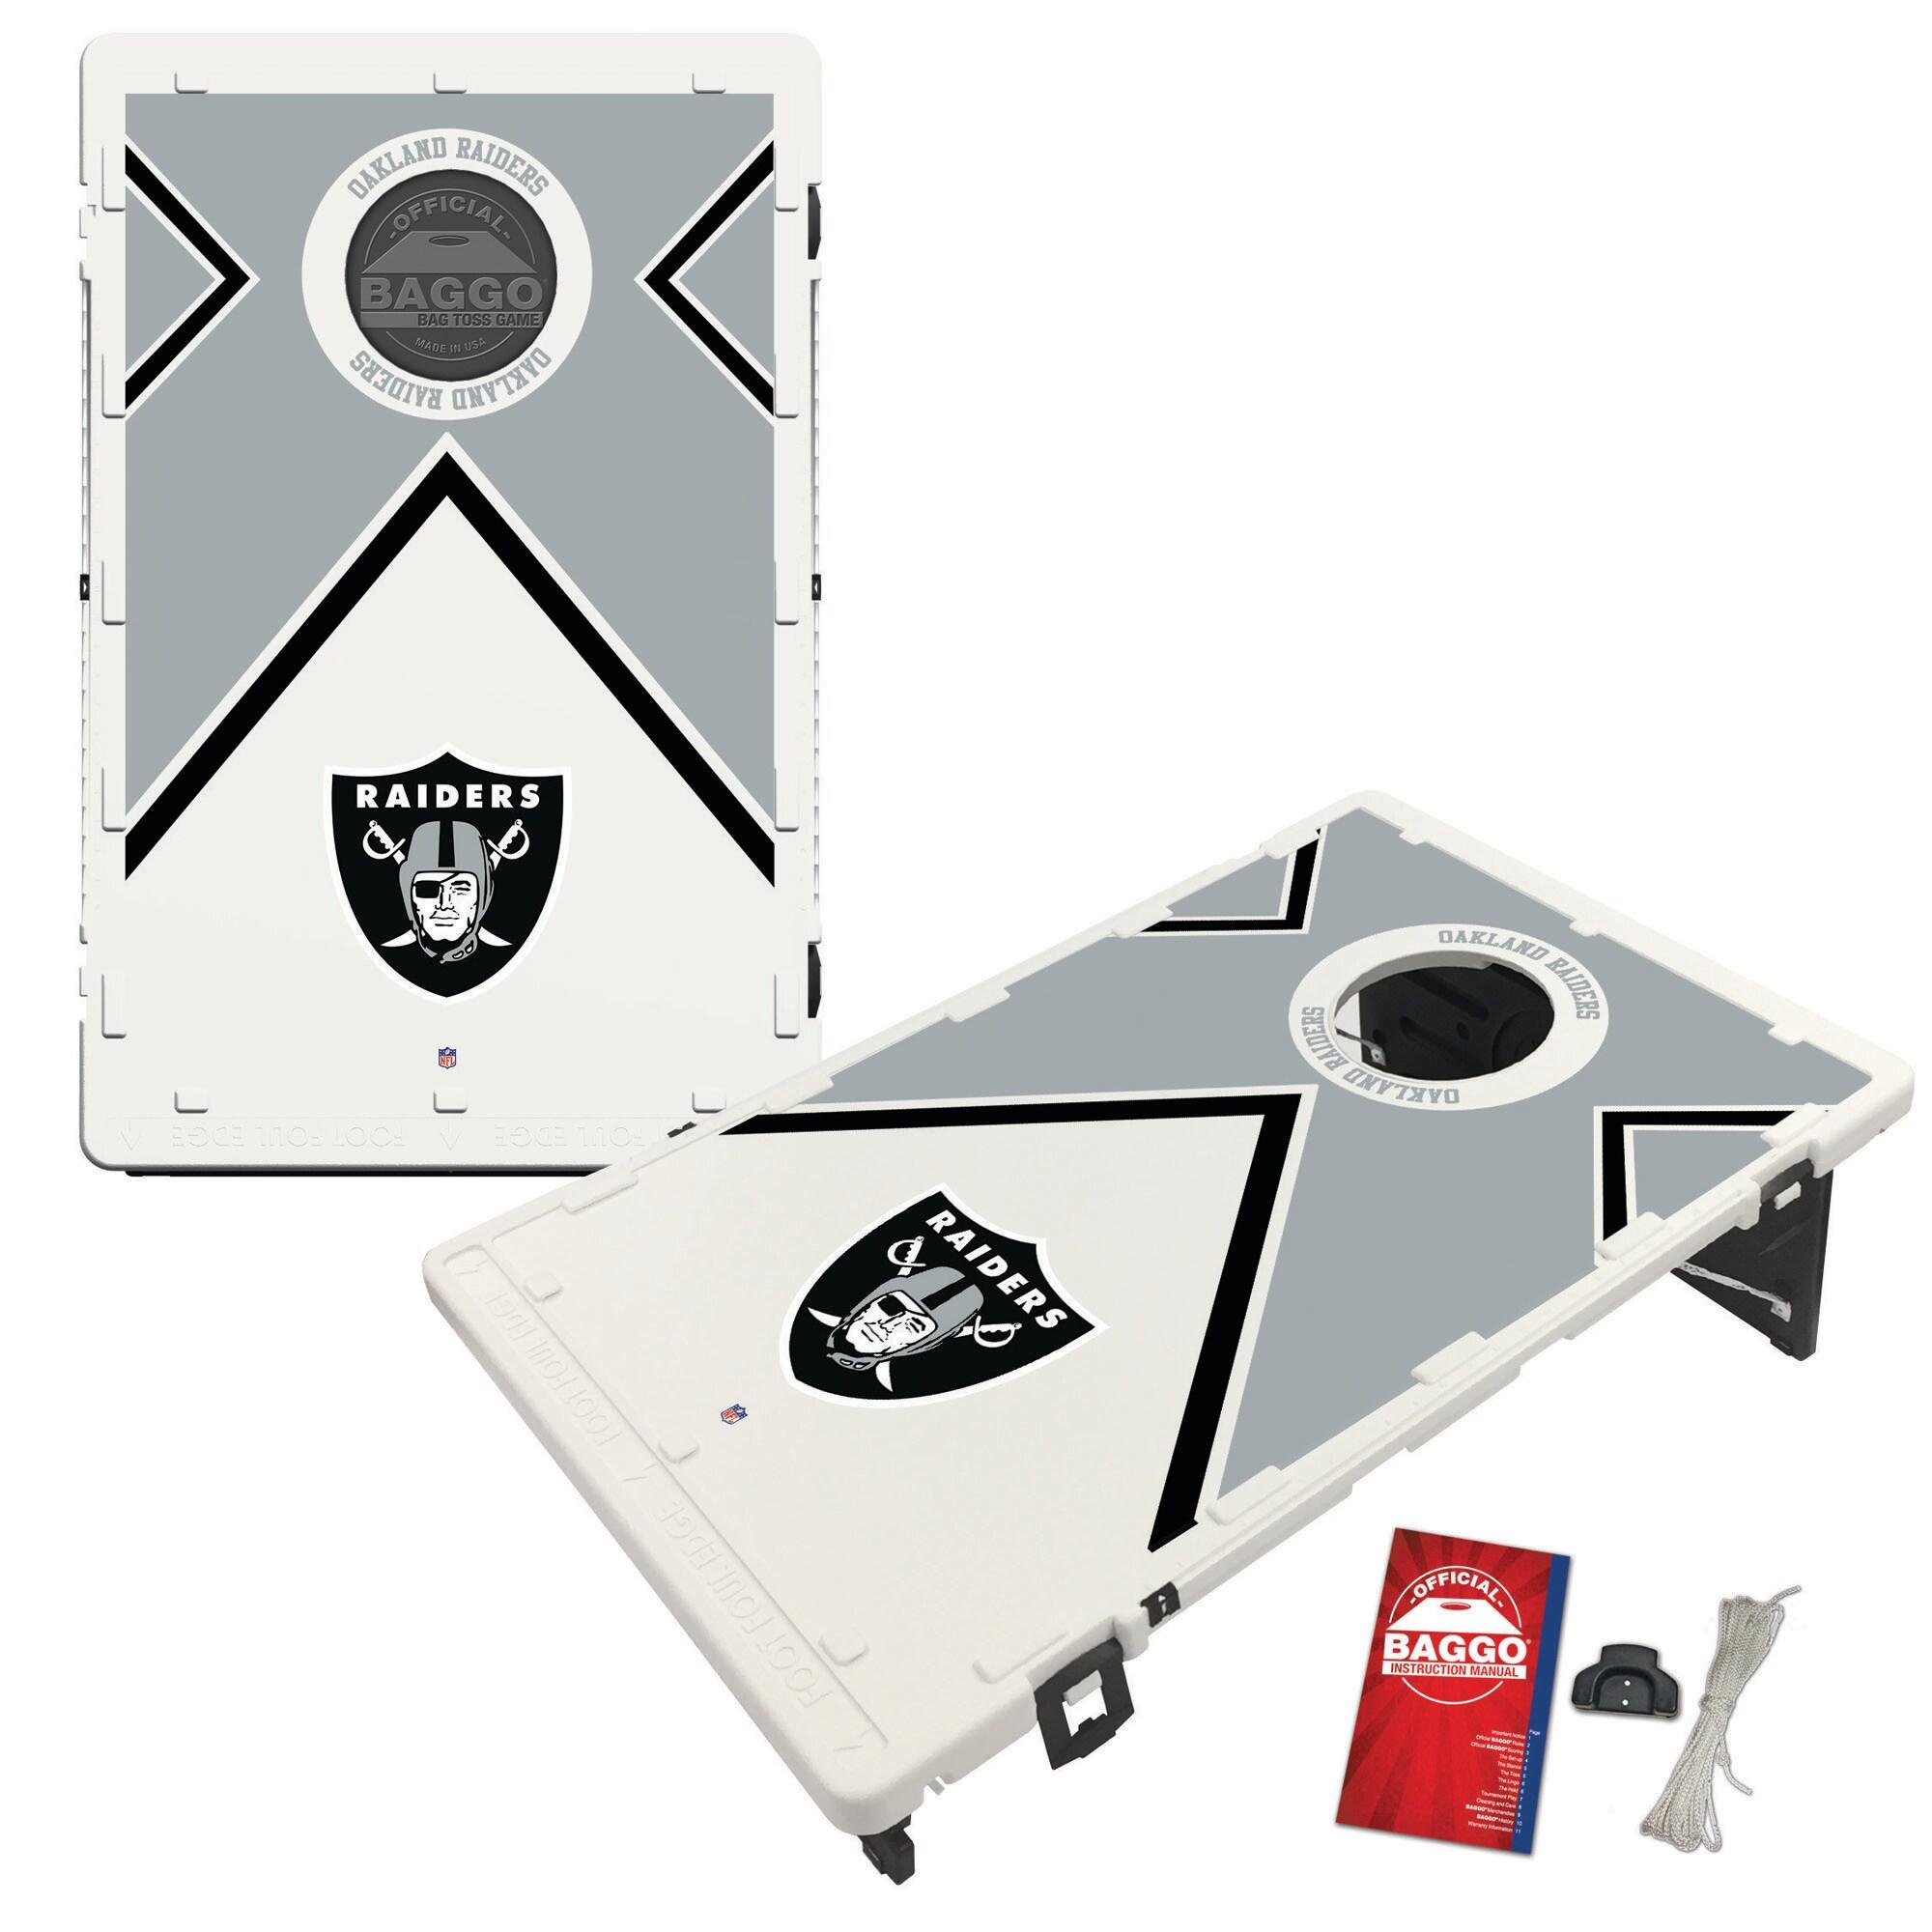 Las Vegas Raiders 2' x 3' BAGGO Vintage Cornhole Board Tailgate Toss Set